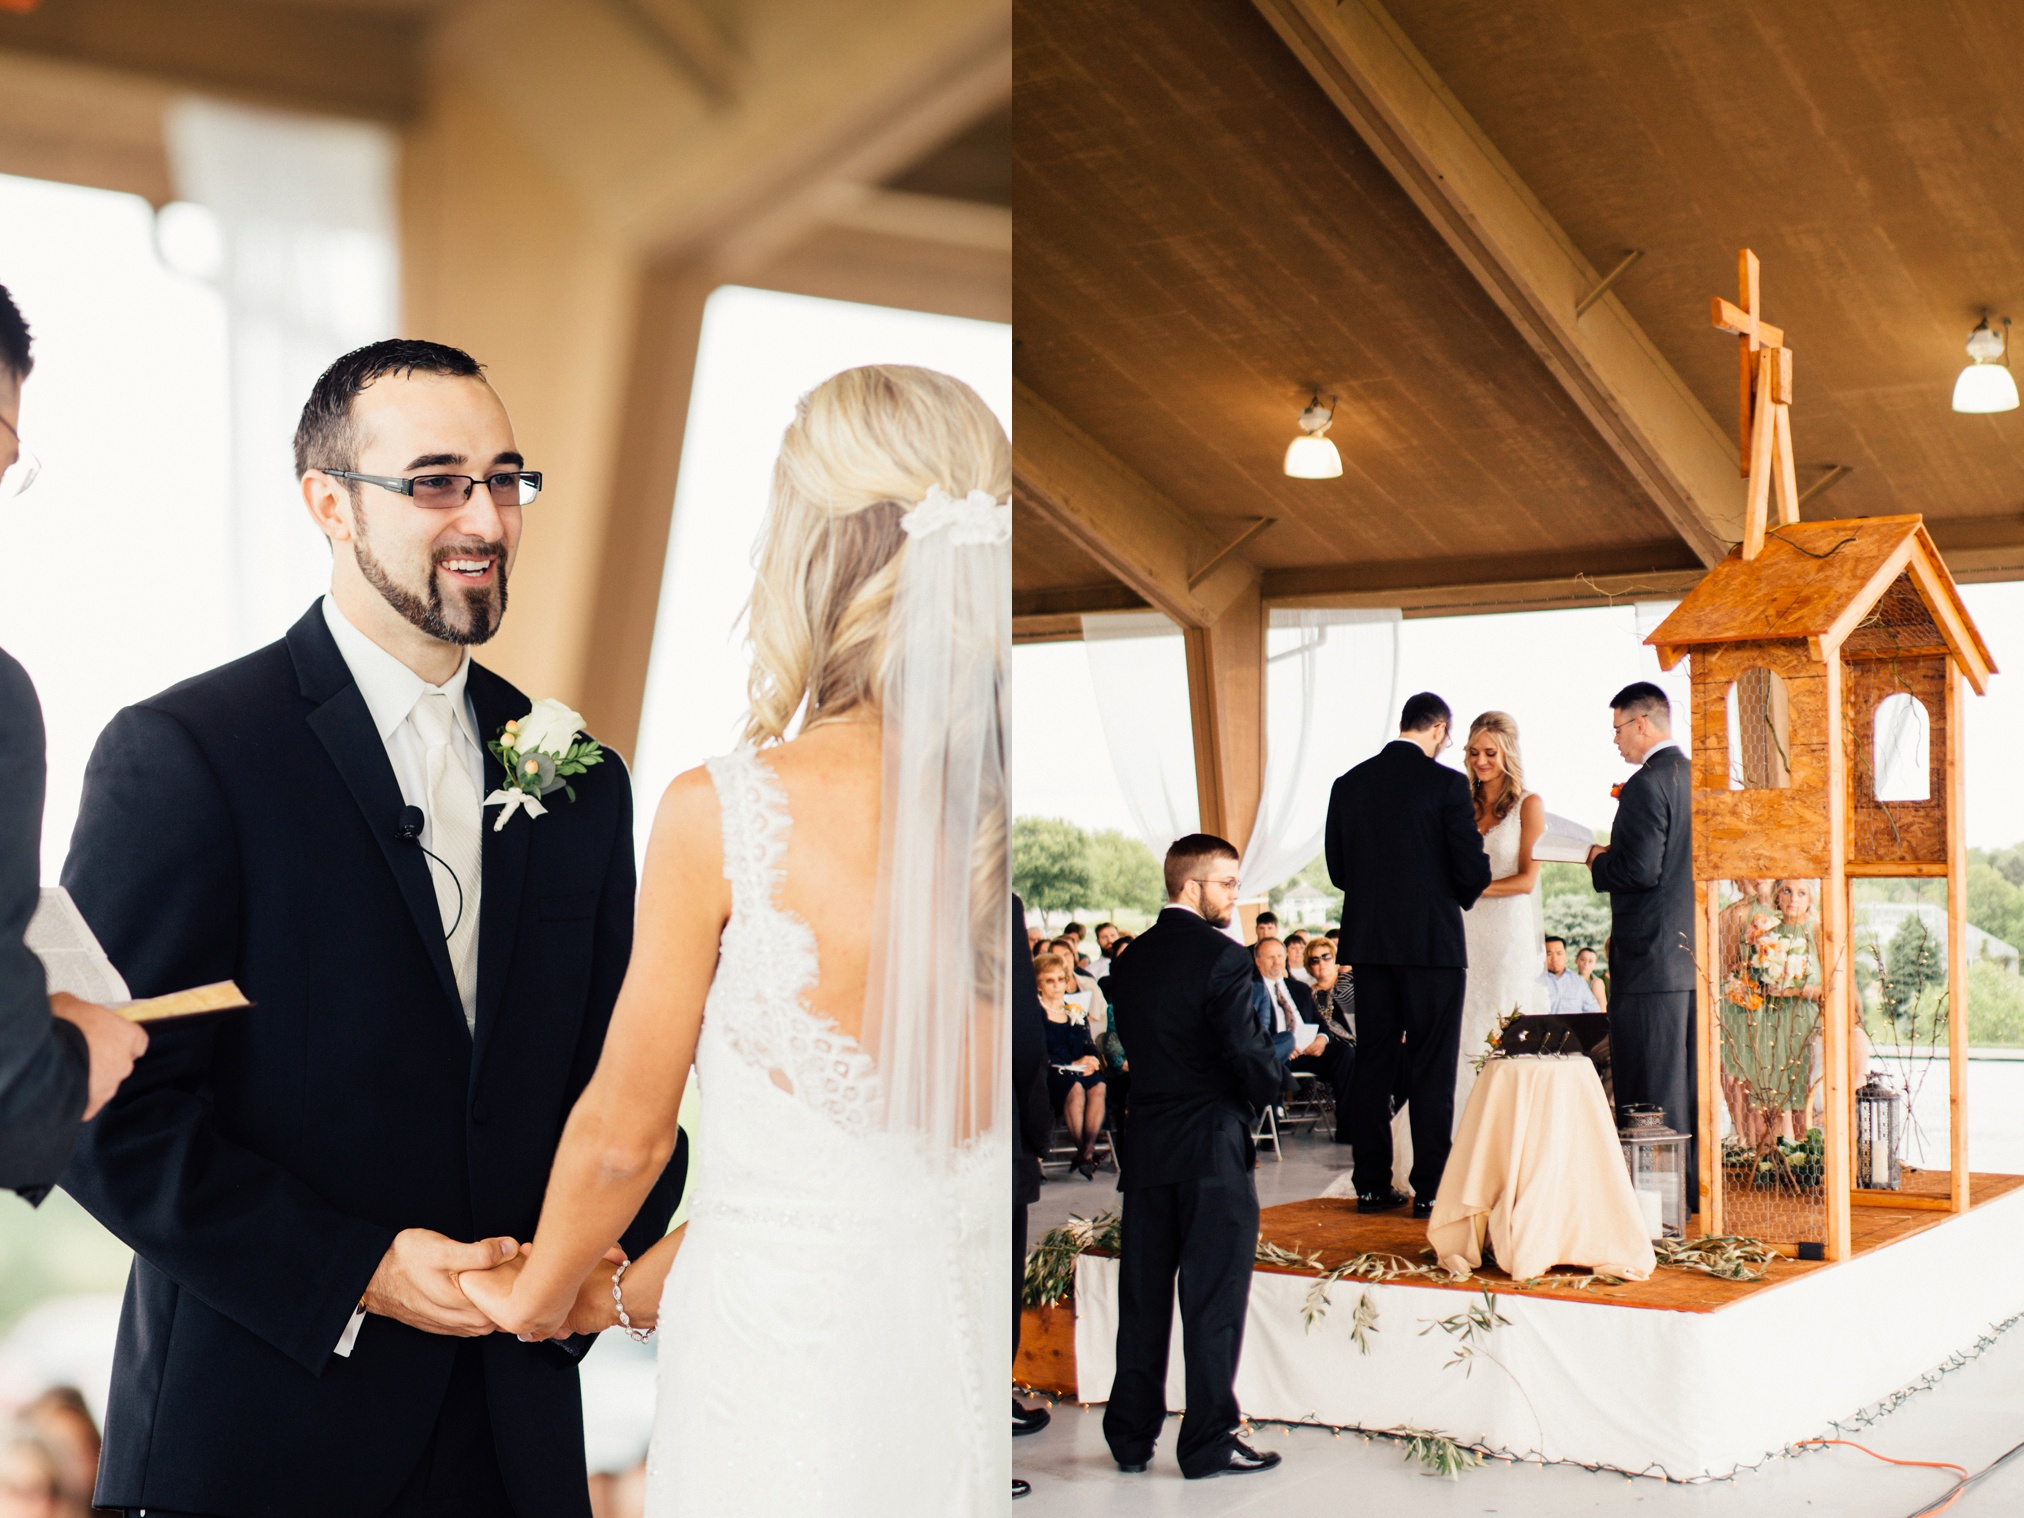 schmid_wedding-512.jpg